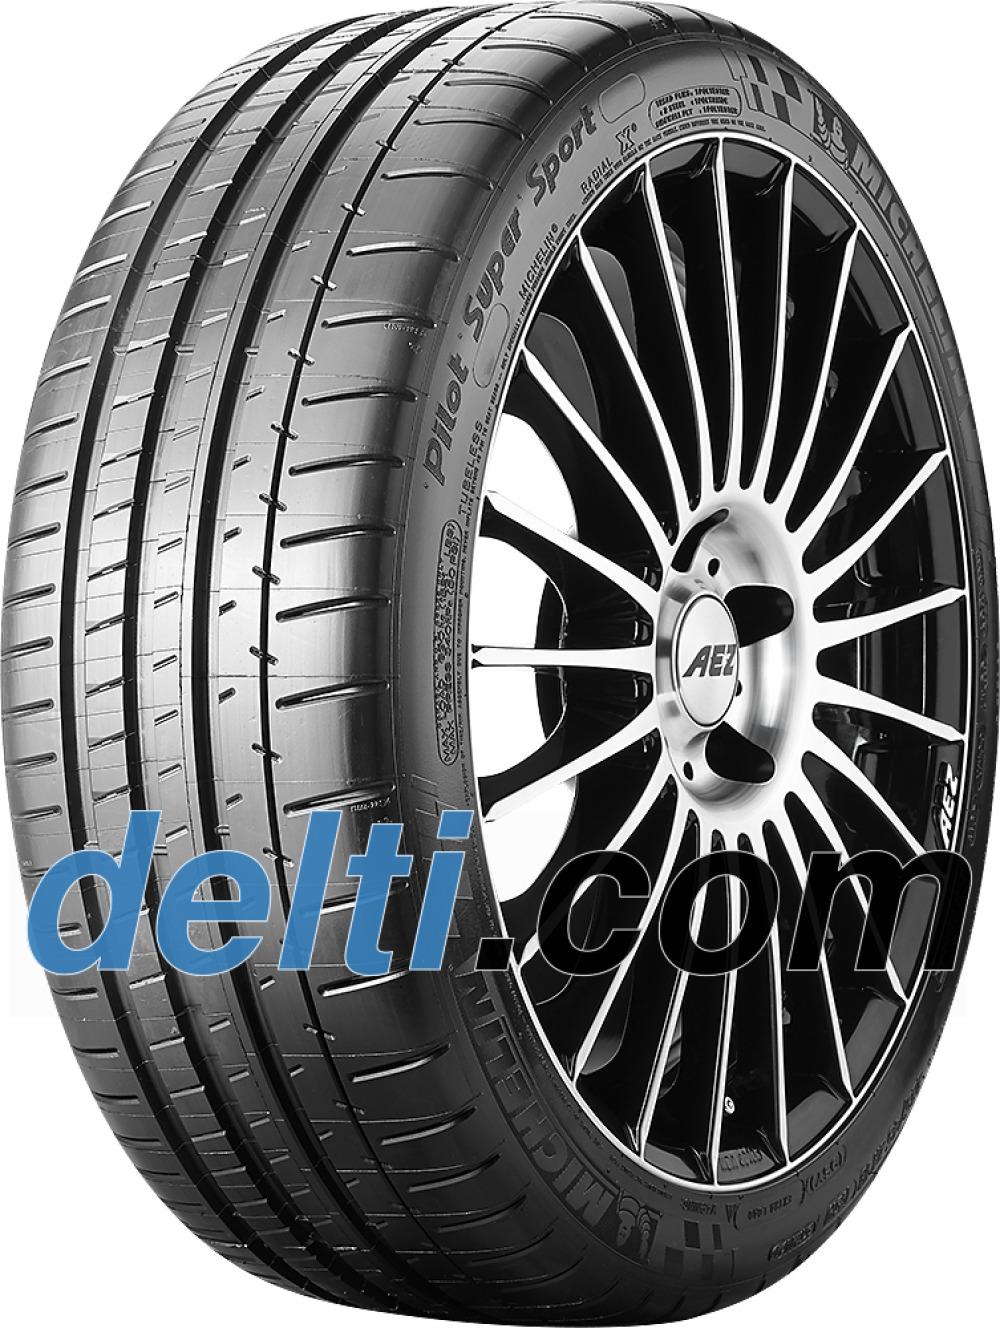 Michelin Pilot Super Sport ( 285/30 ZR19 (98Y) XL MO1, vanteen suojalistalla  (FSL) )